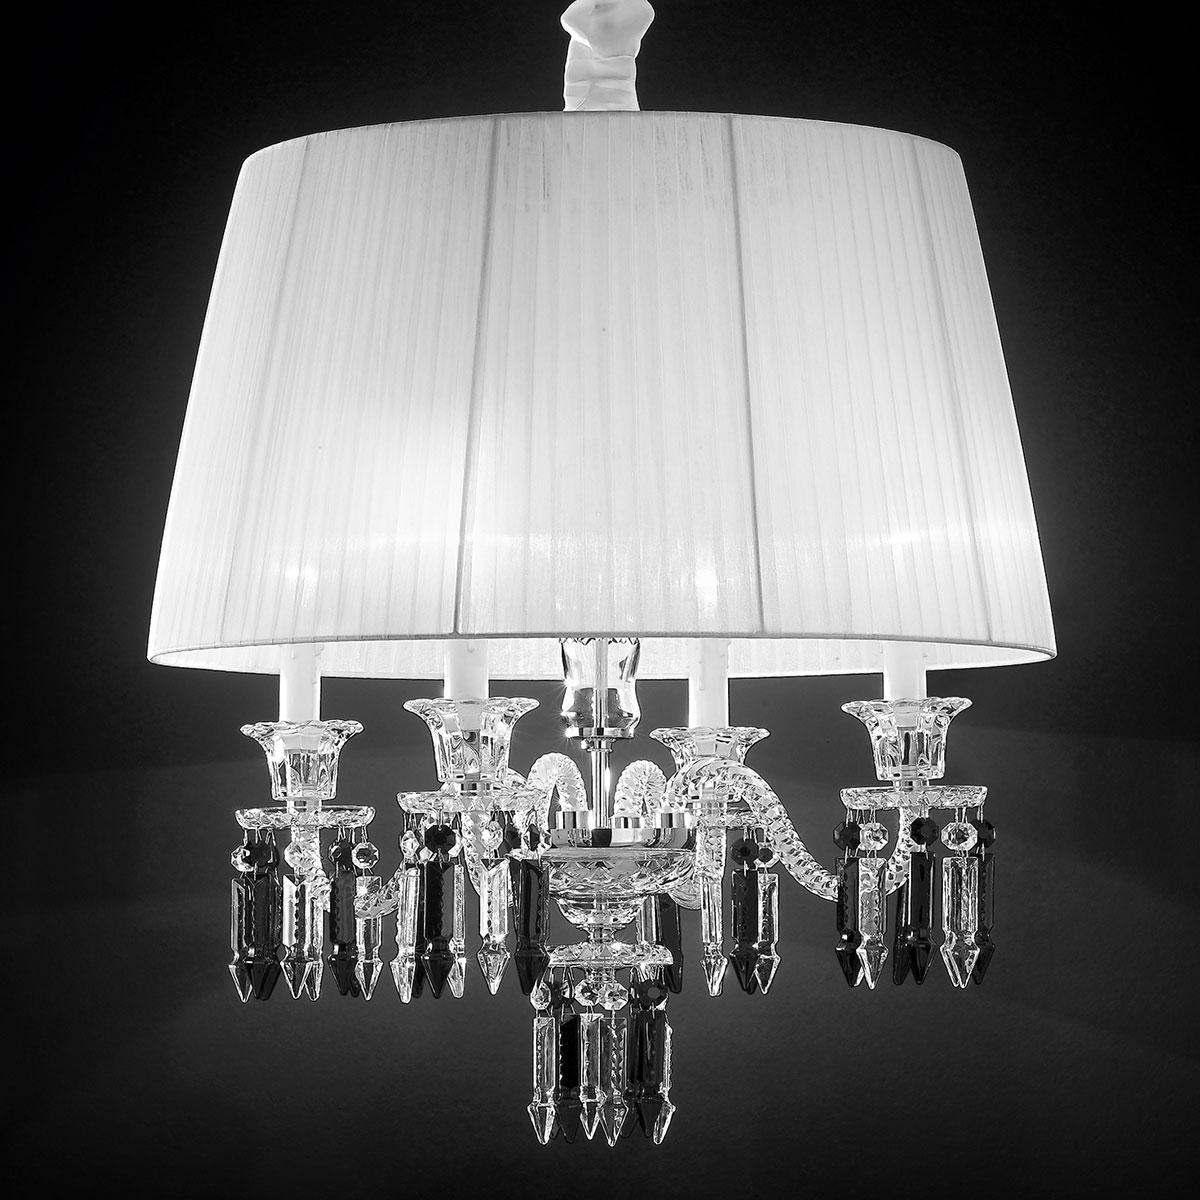 """Cima"" lámpara colgante veneciana en cristal - 4 luces - transparente con pantallas"